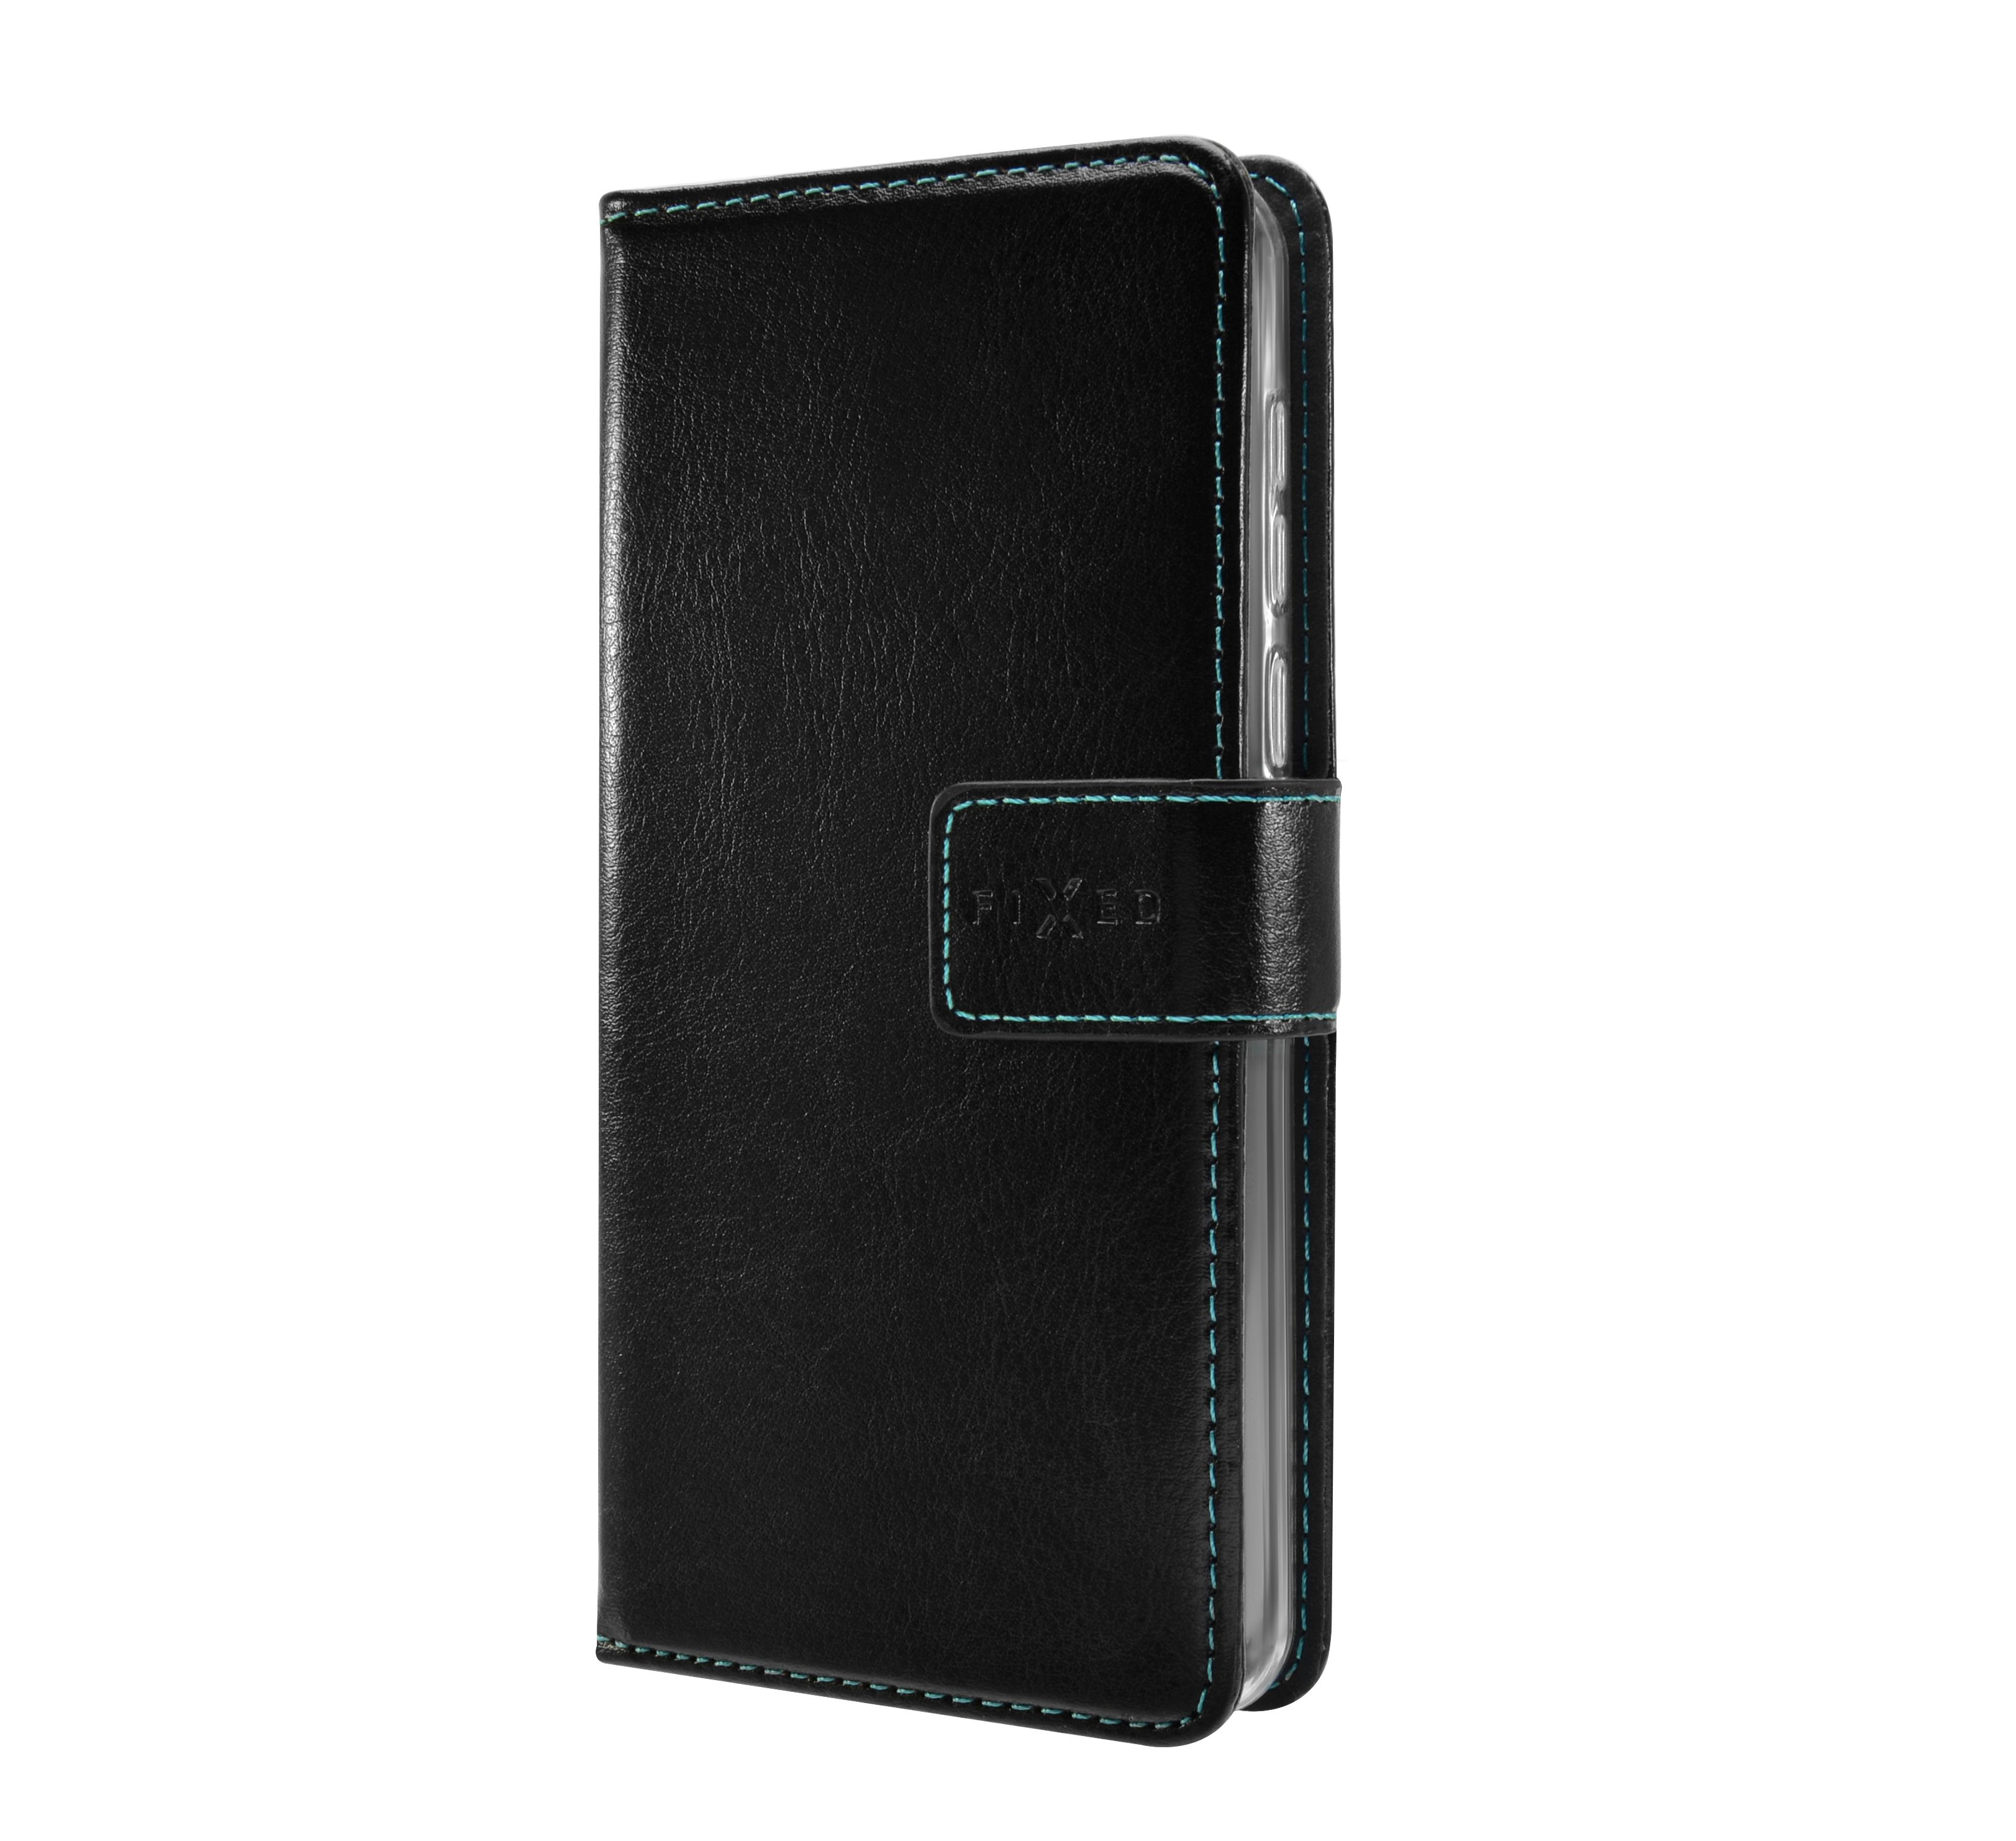 Pouzdro typu kniha FIXED Opus pro Samsung Galaxy Note10, černé